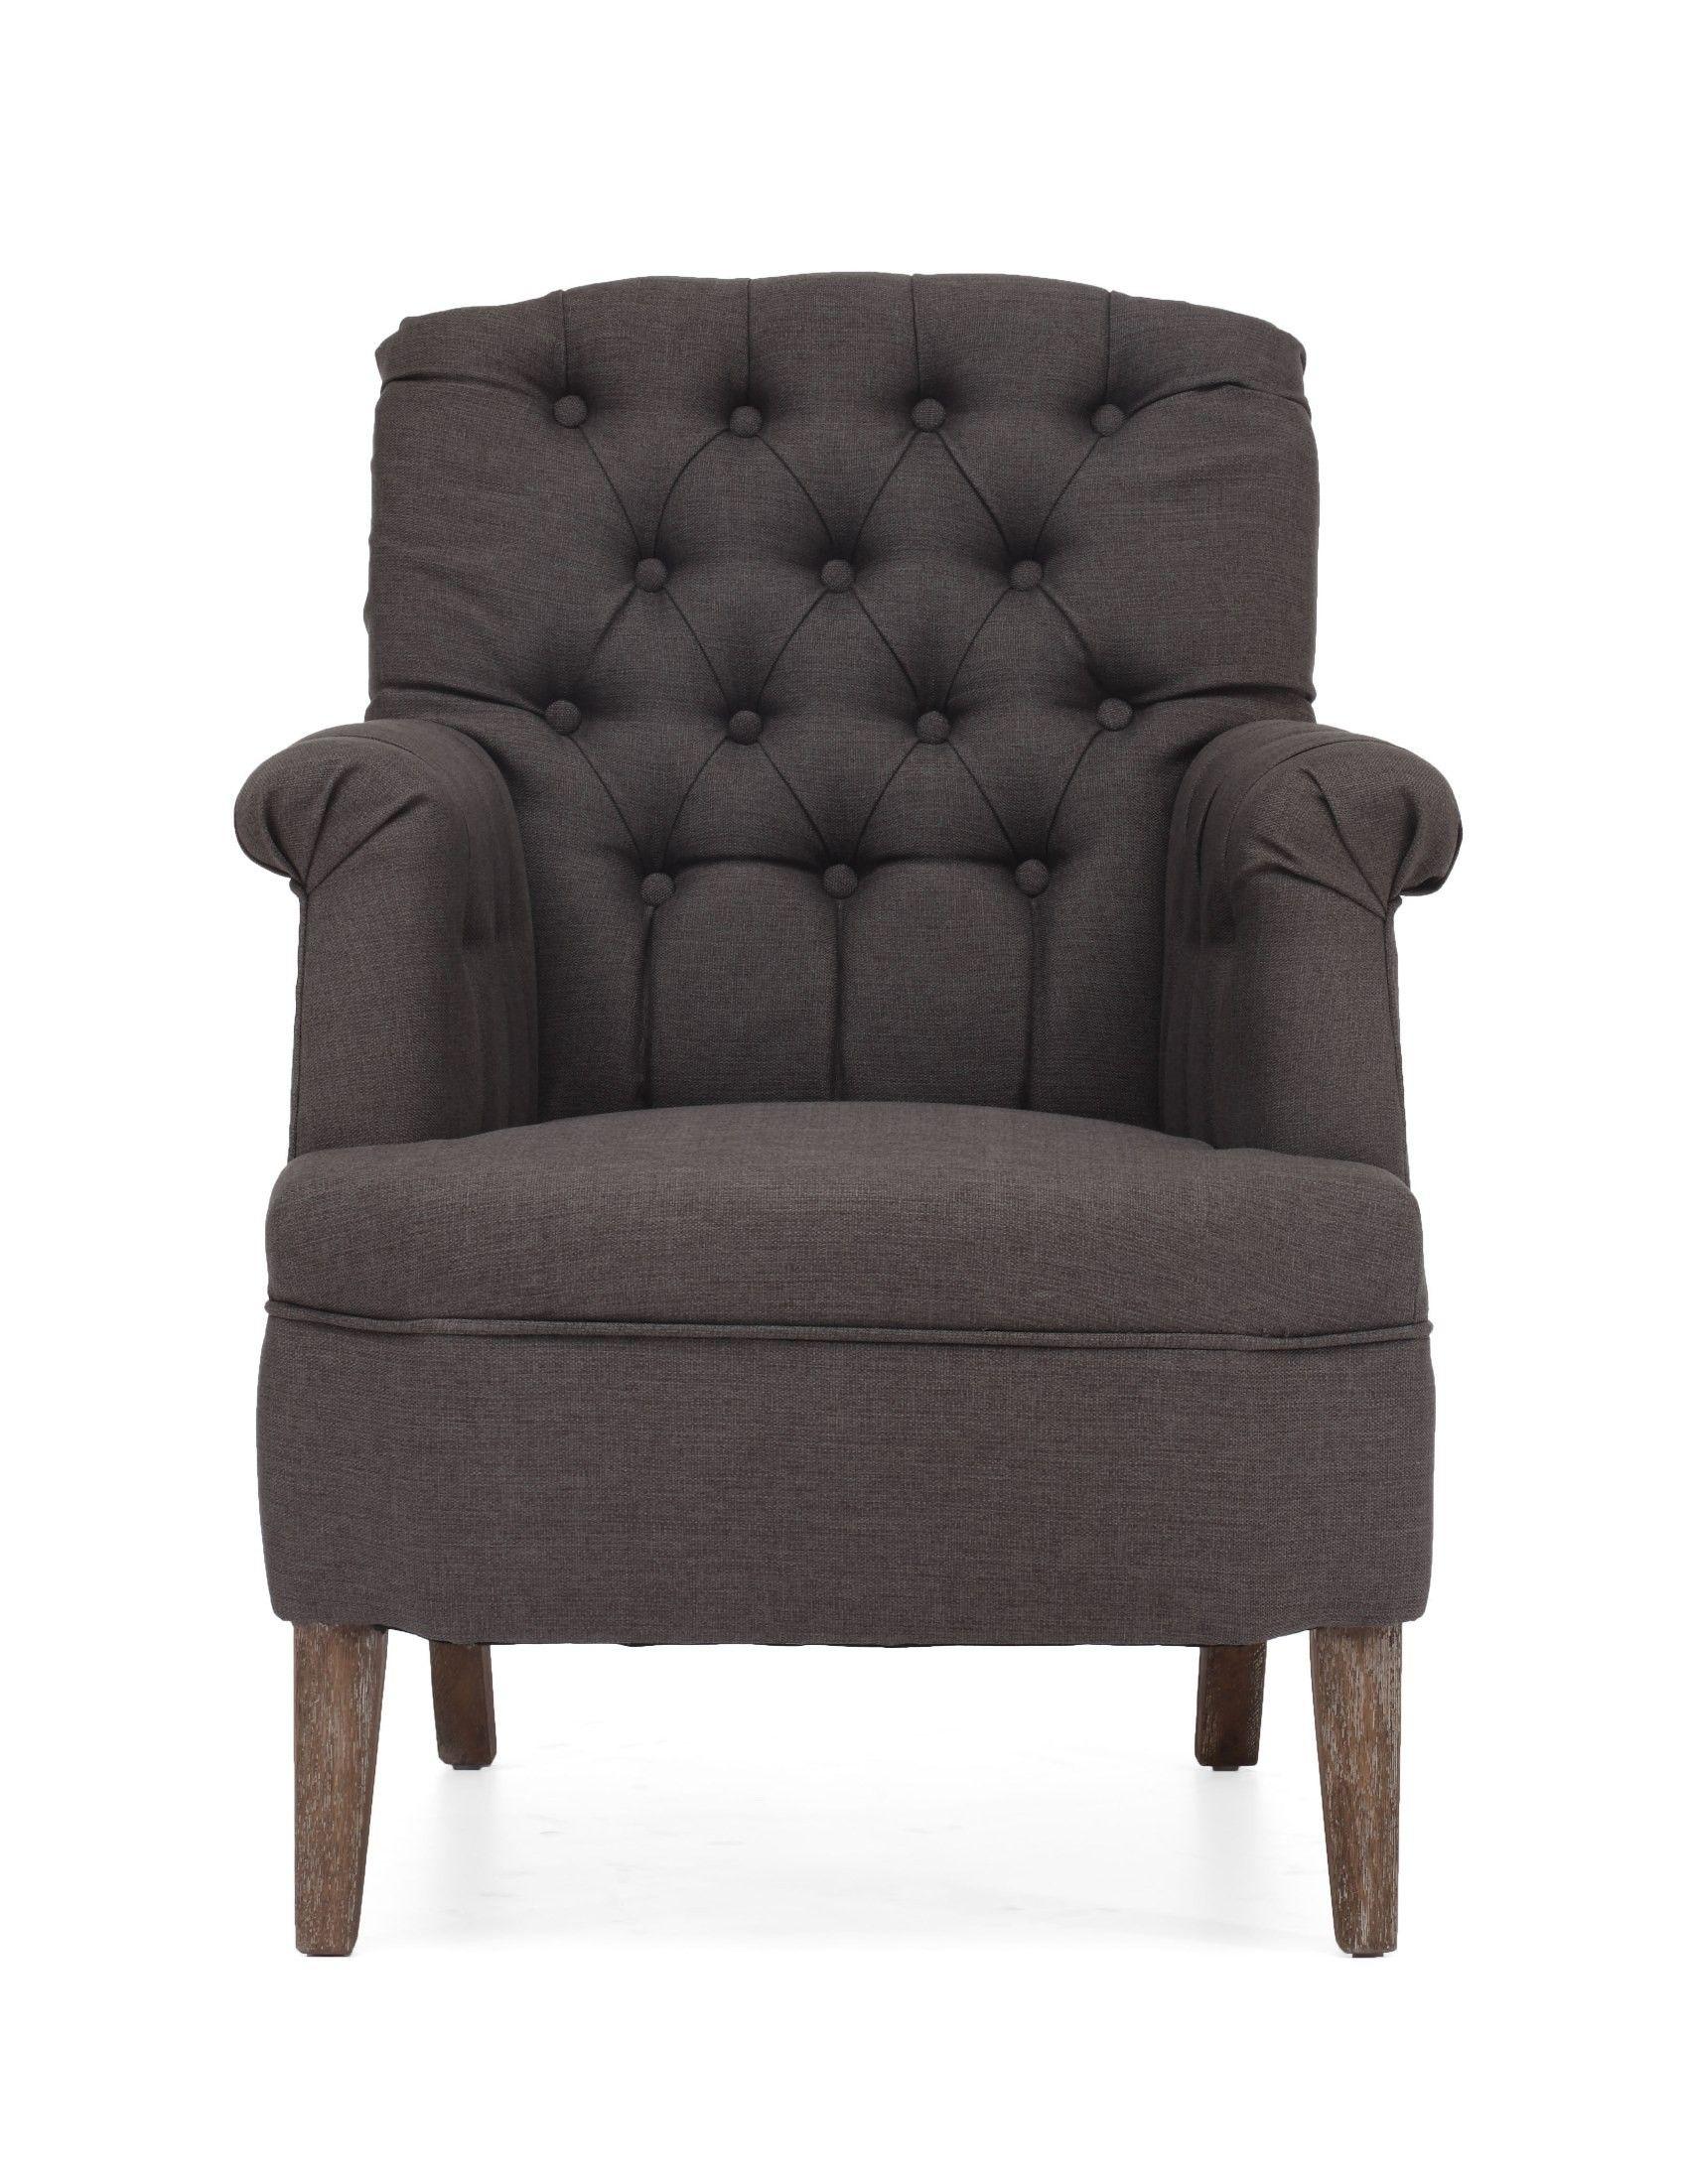 Superieur Castro Charcoal Gray Armchair